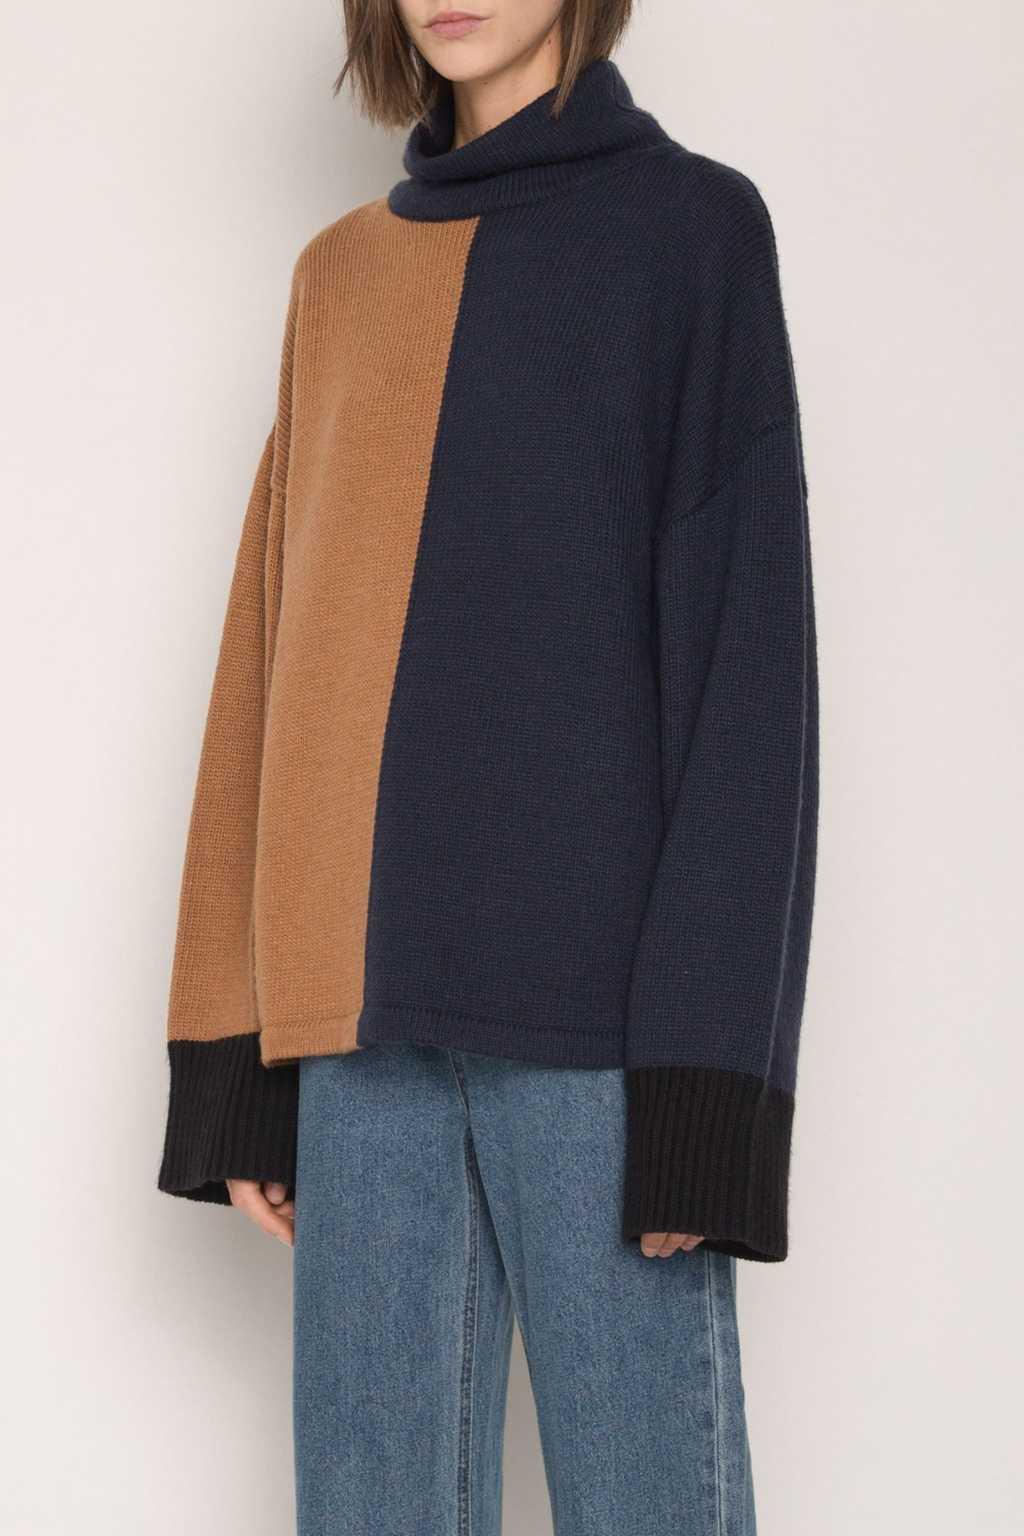 Sweater 1745 Navy 2